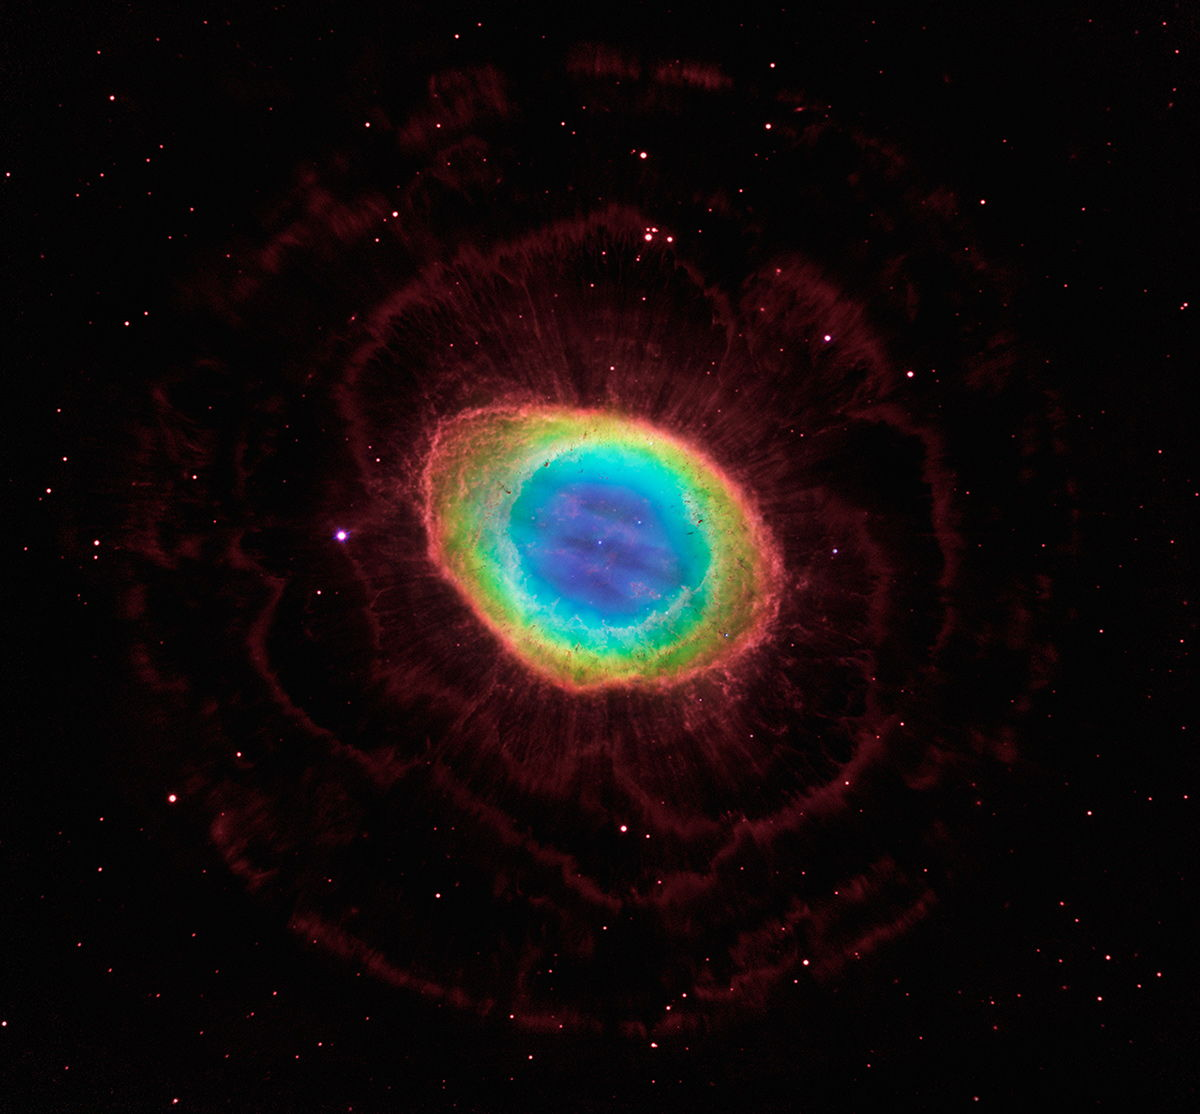 Hubble Telescope Reveals True 3D Shape of Ring Nebula (Photos)